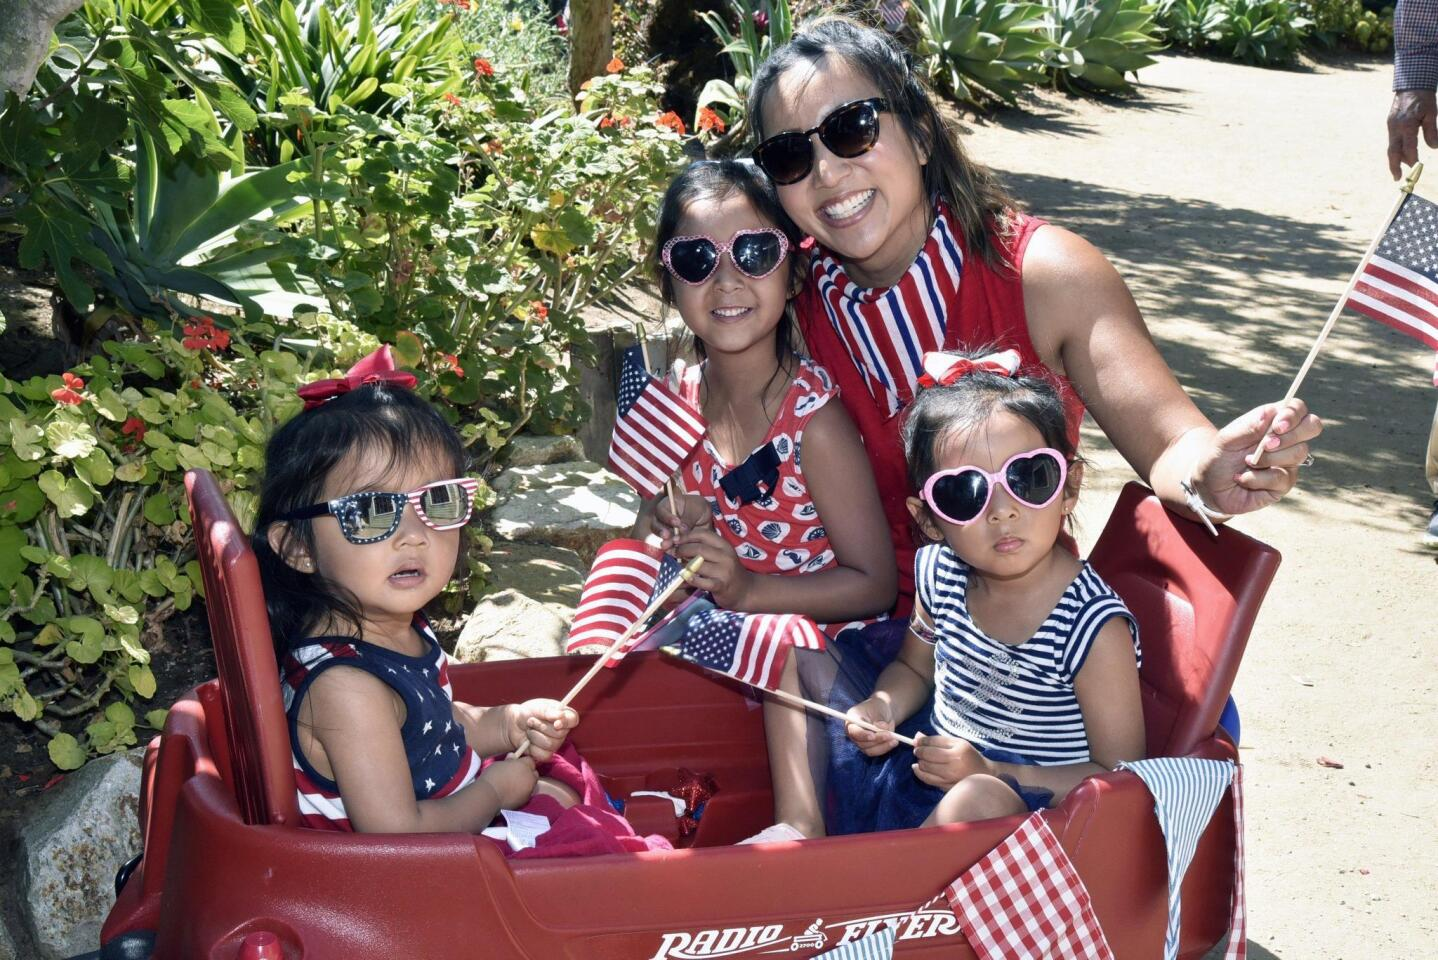 Michelle Silva with Mikaela, Nayeli, and Olivia